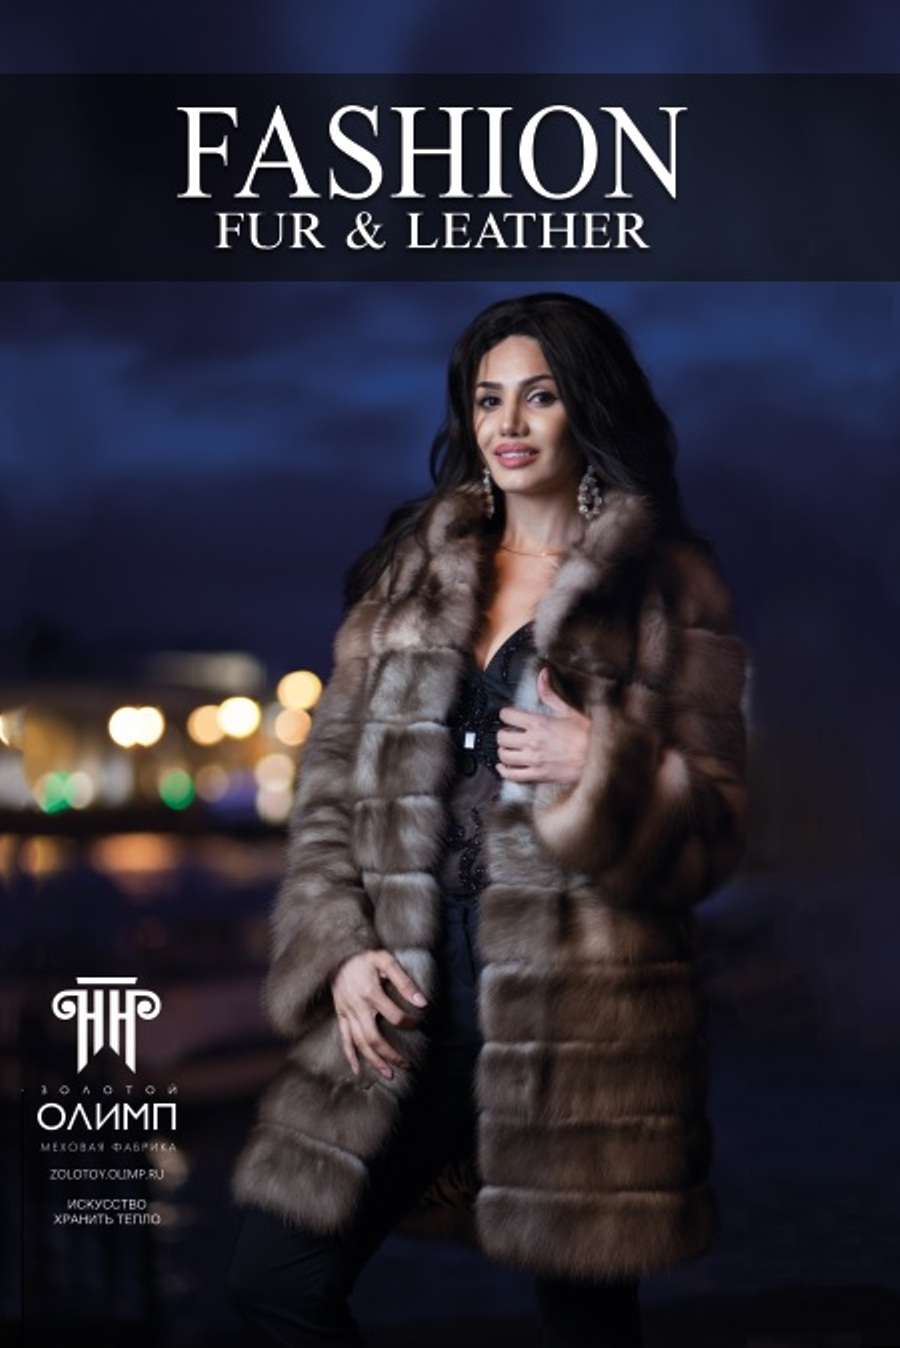 Журнал FASHION Fur&Leather, №3